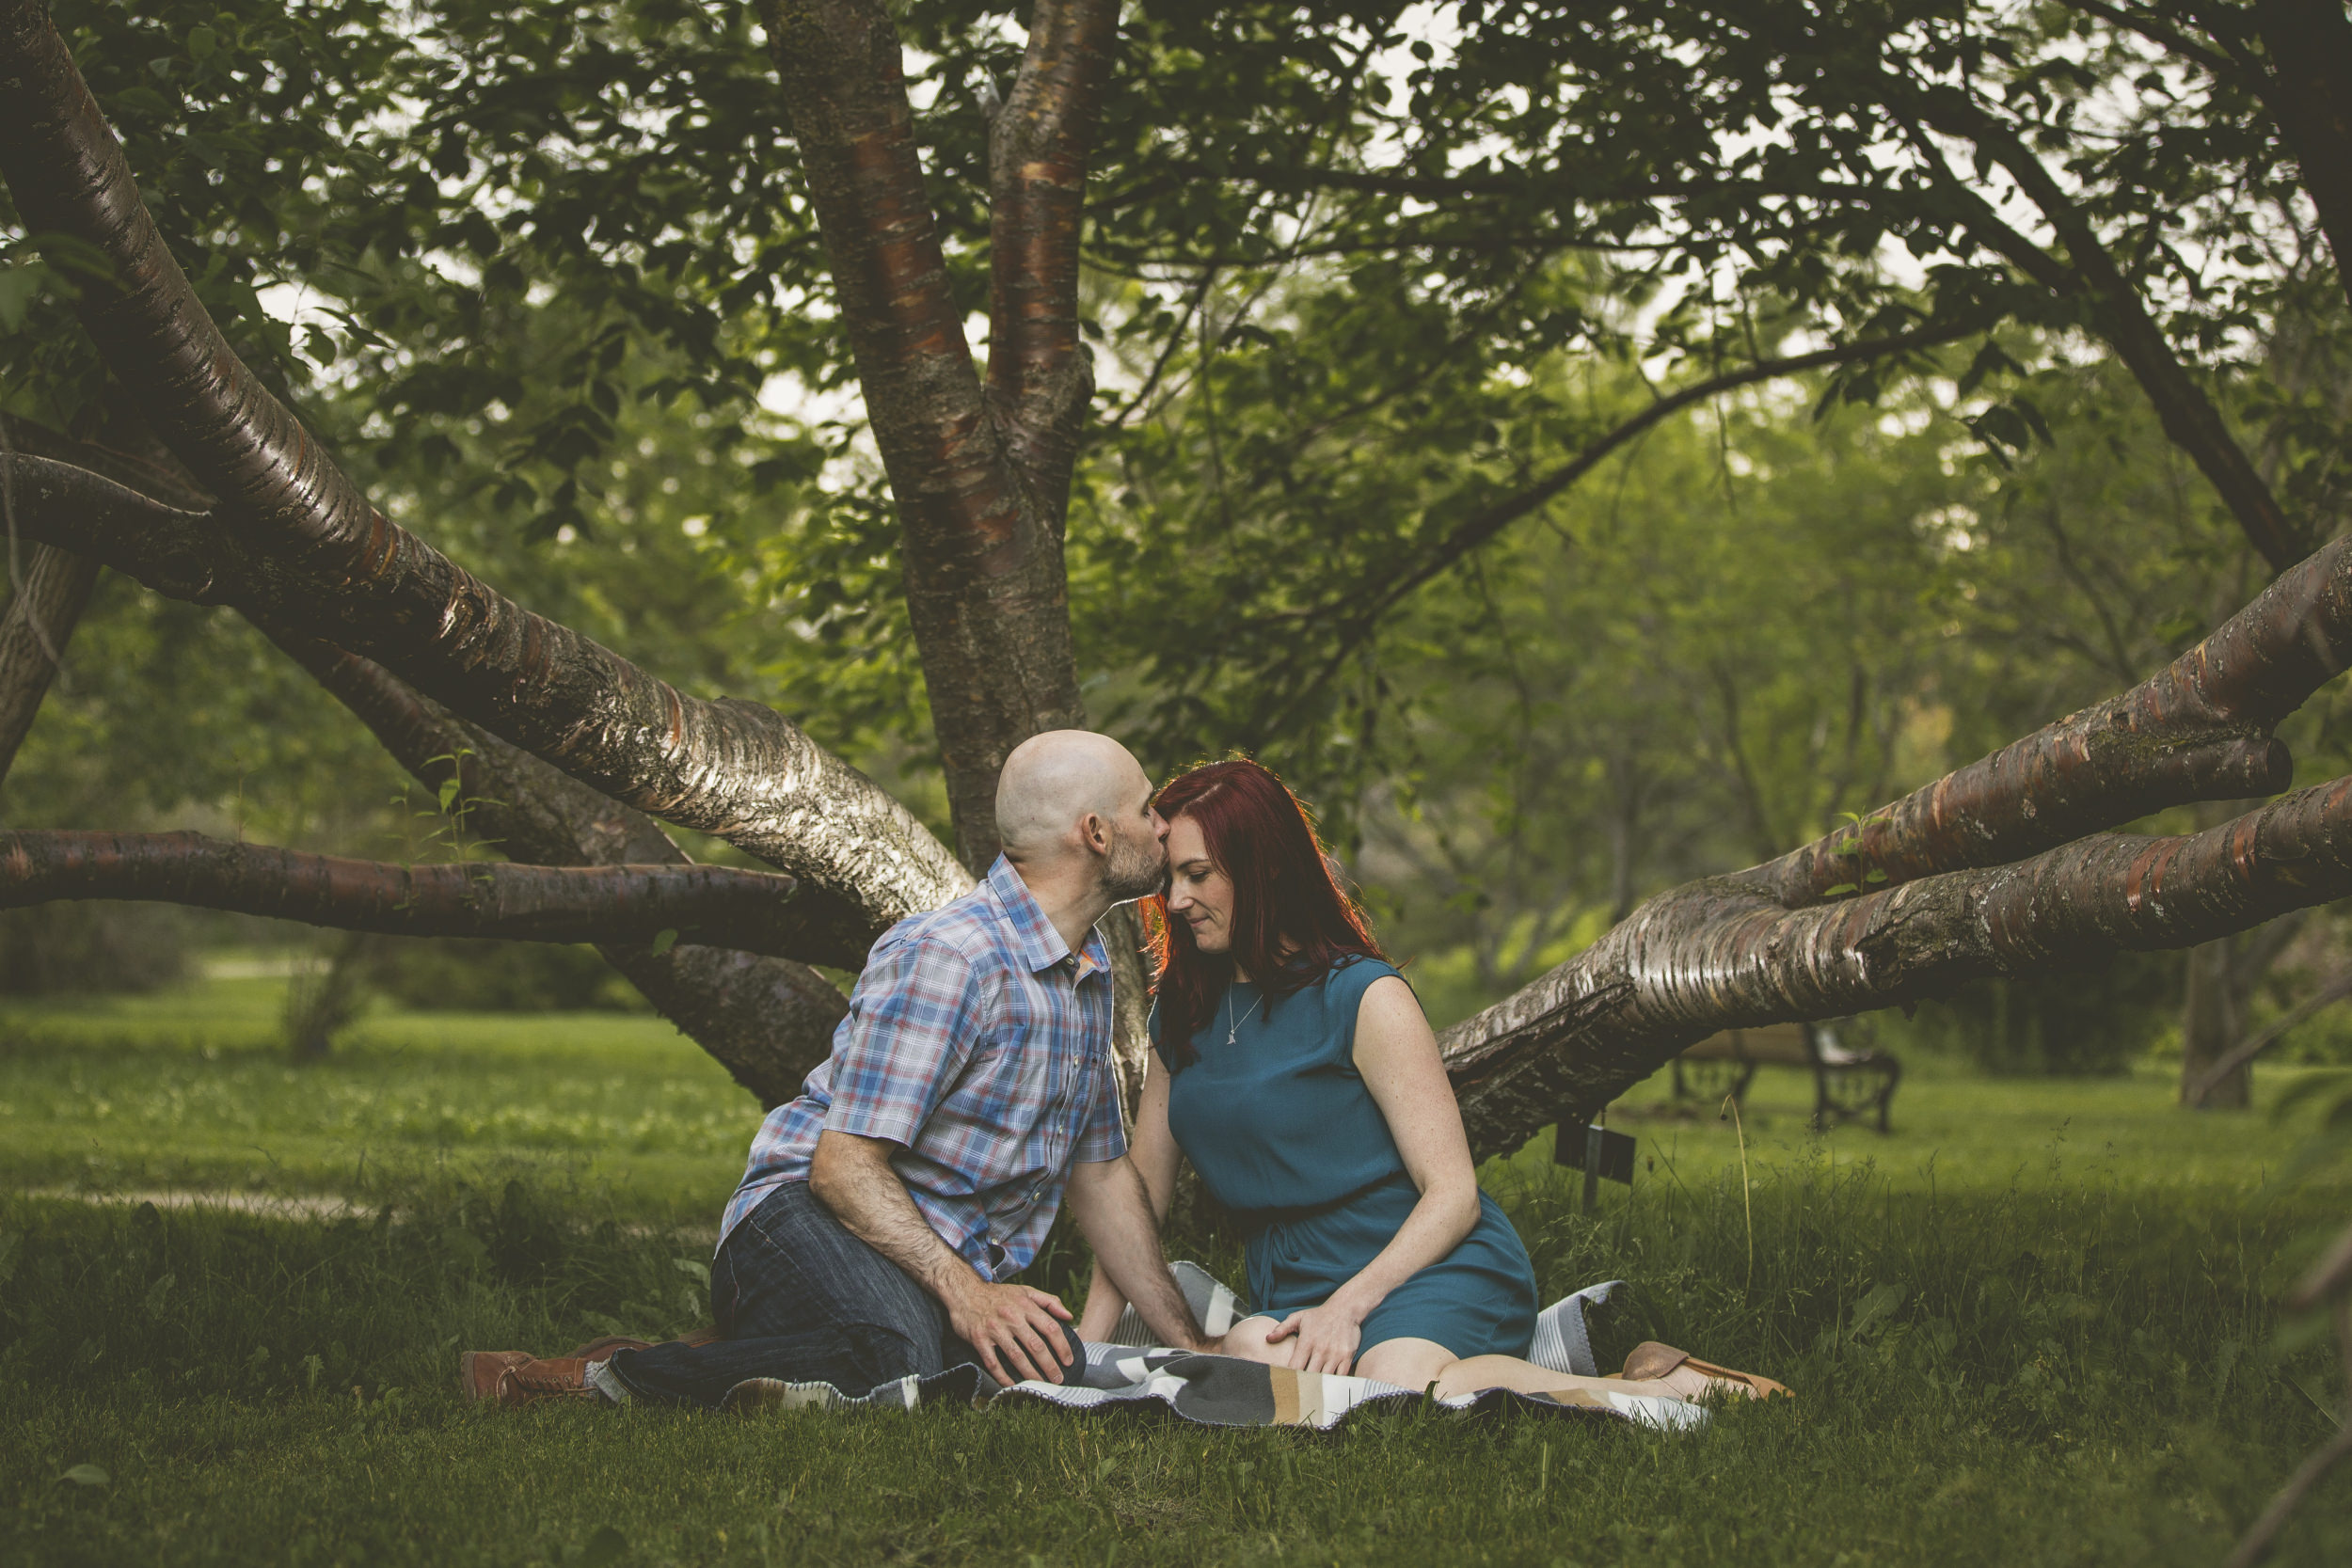 MG 1729 2 - Engagement Portfolio // Post 1 // Sarah